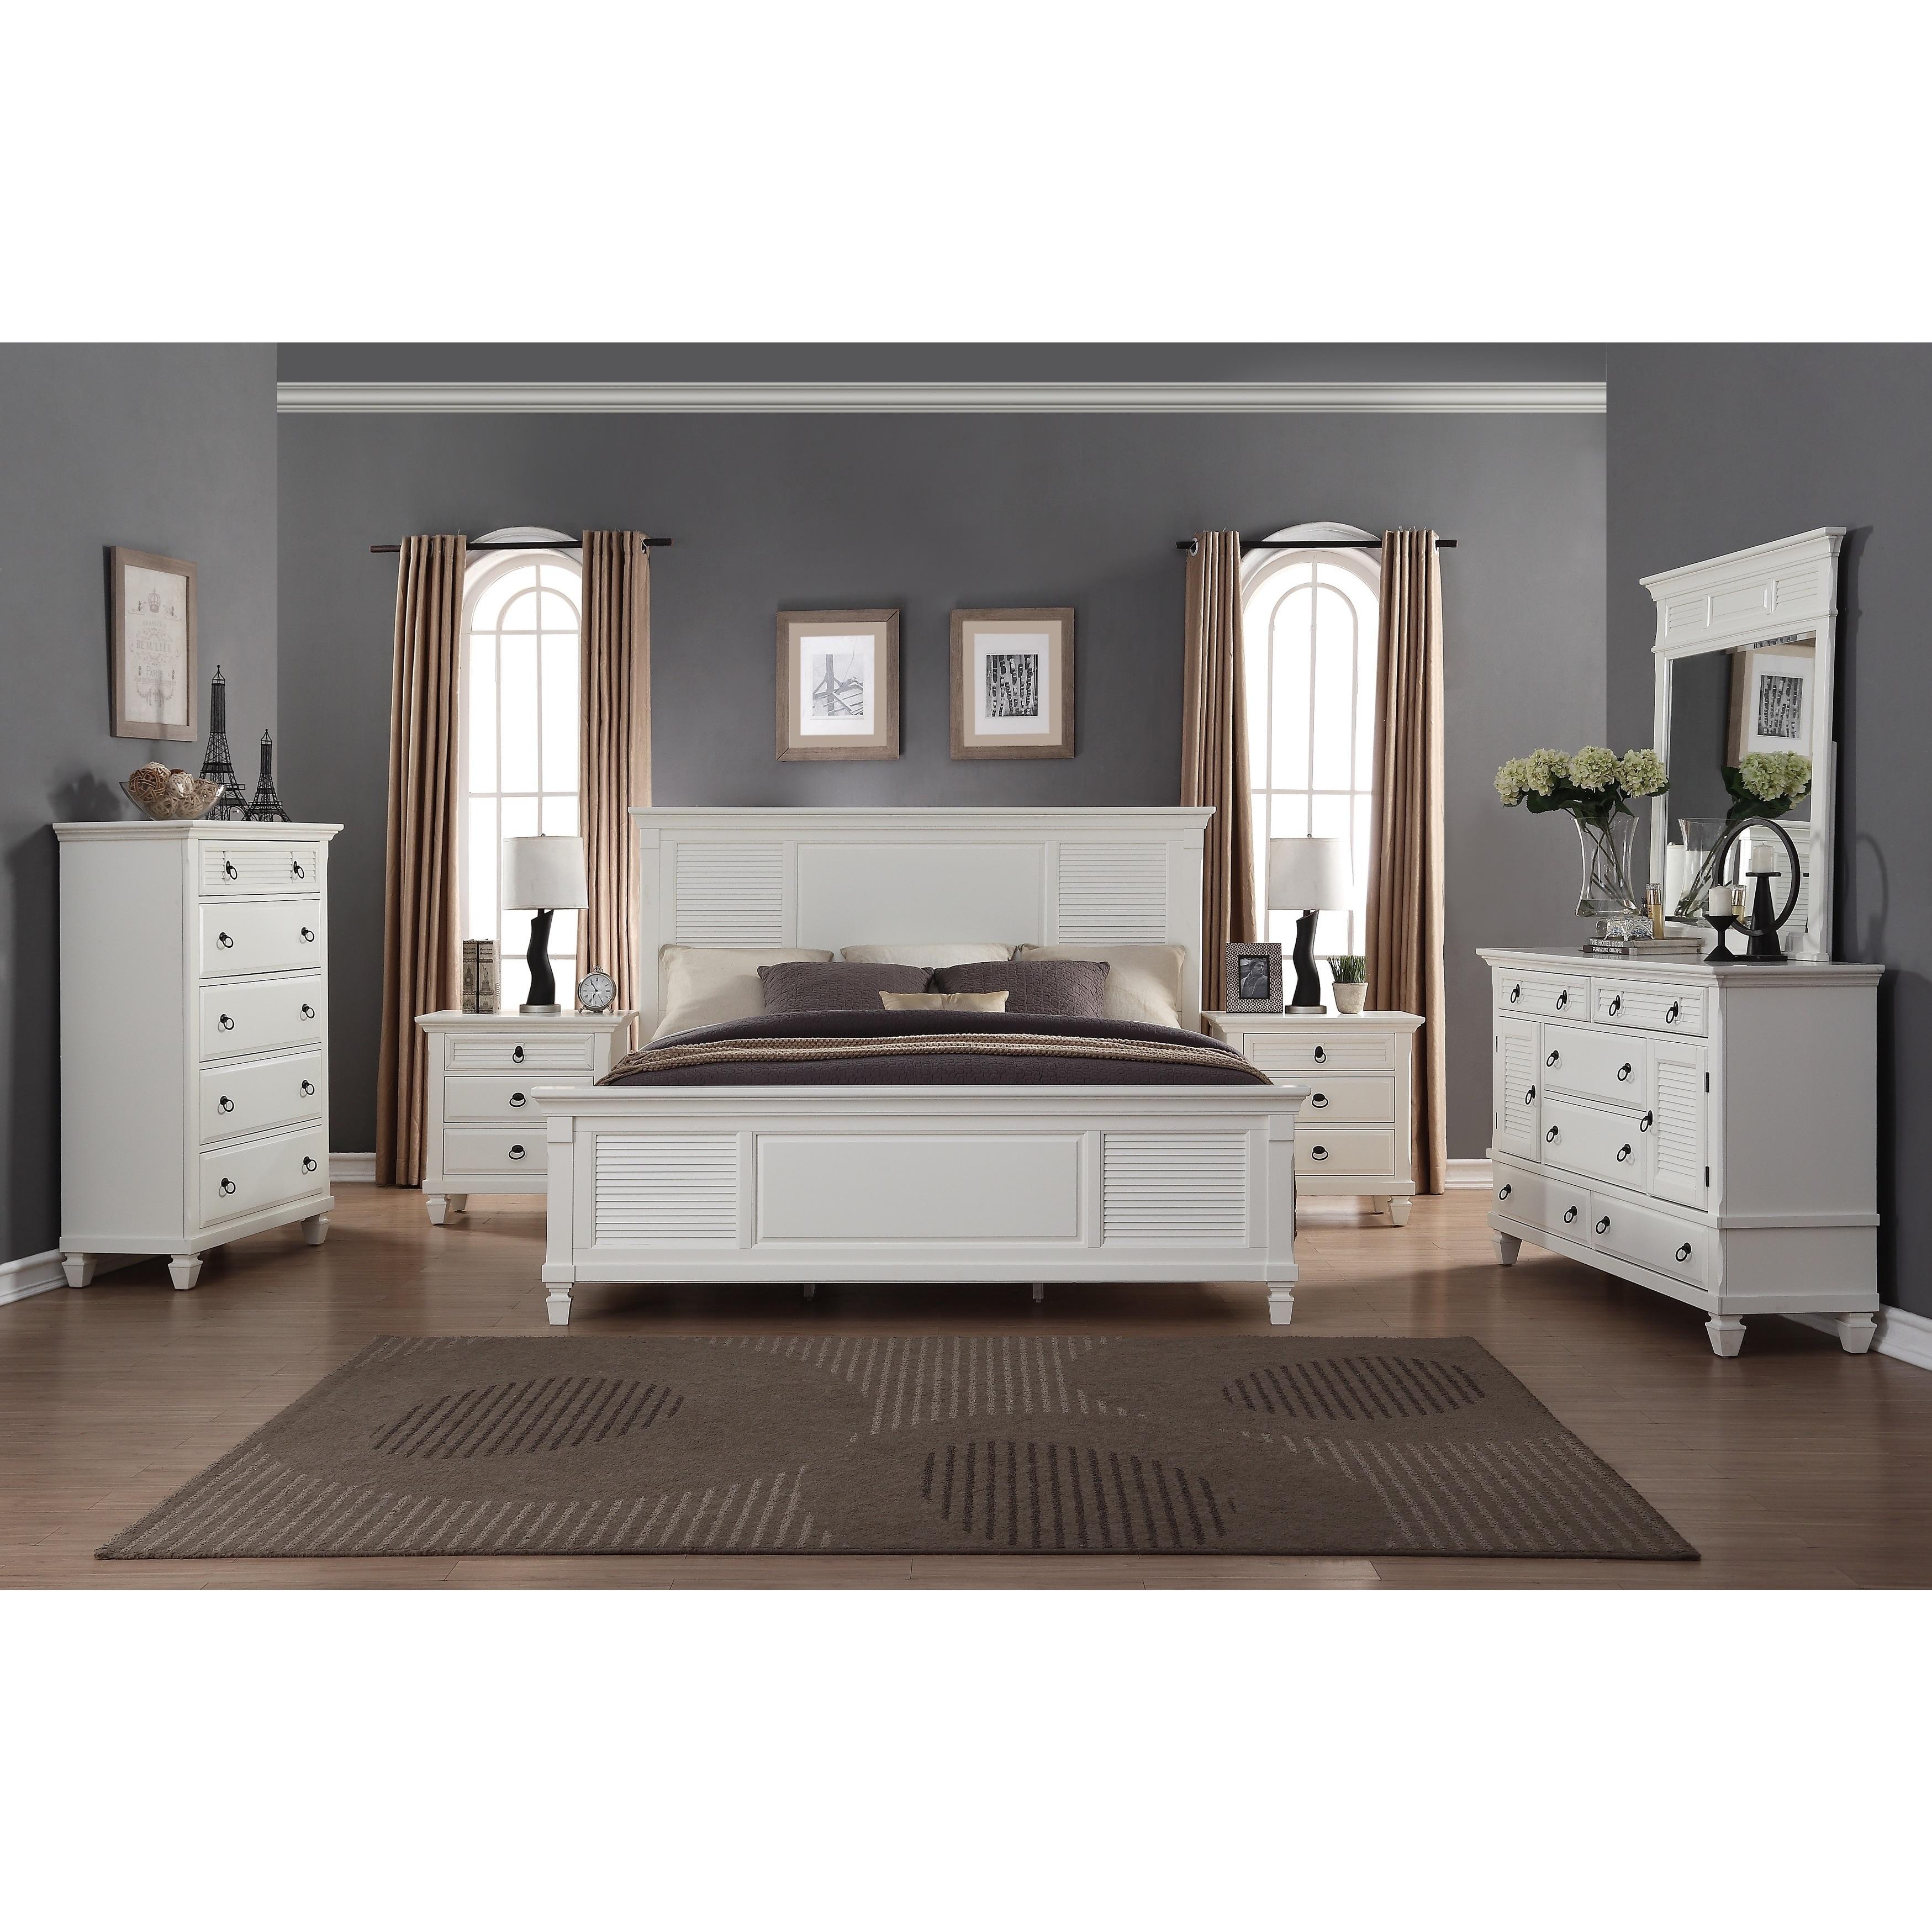 Regitina White 6-Piece King-size Bedroom Furniture Set